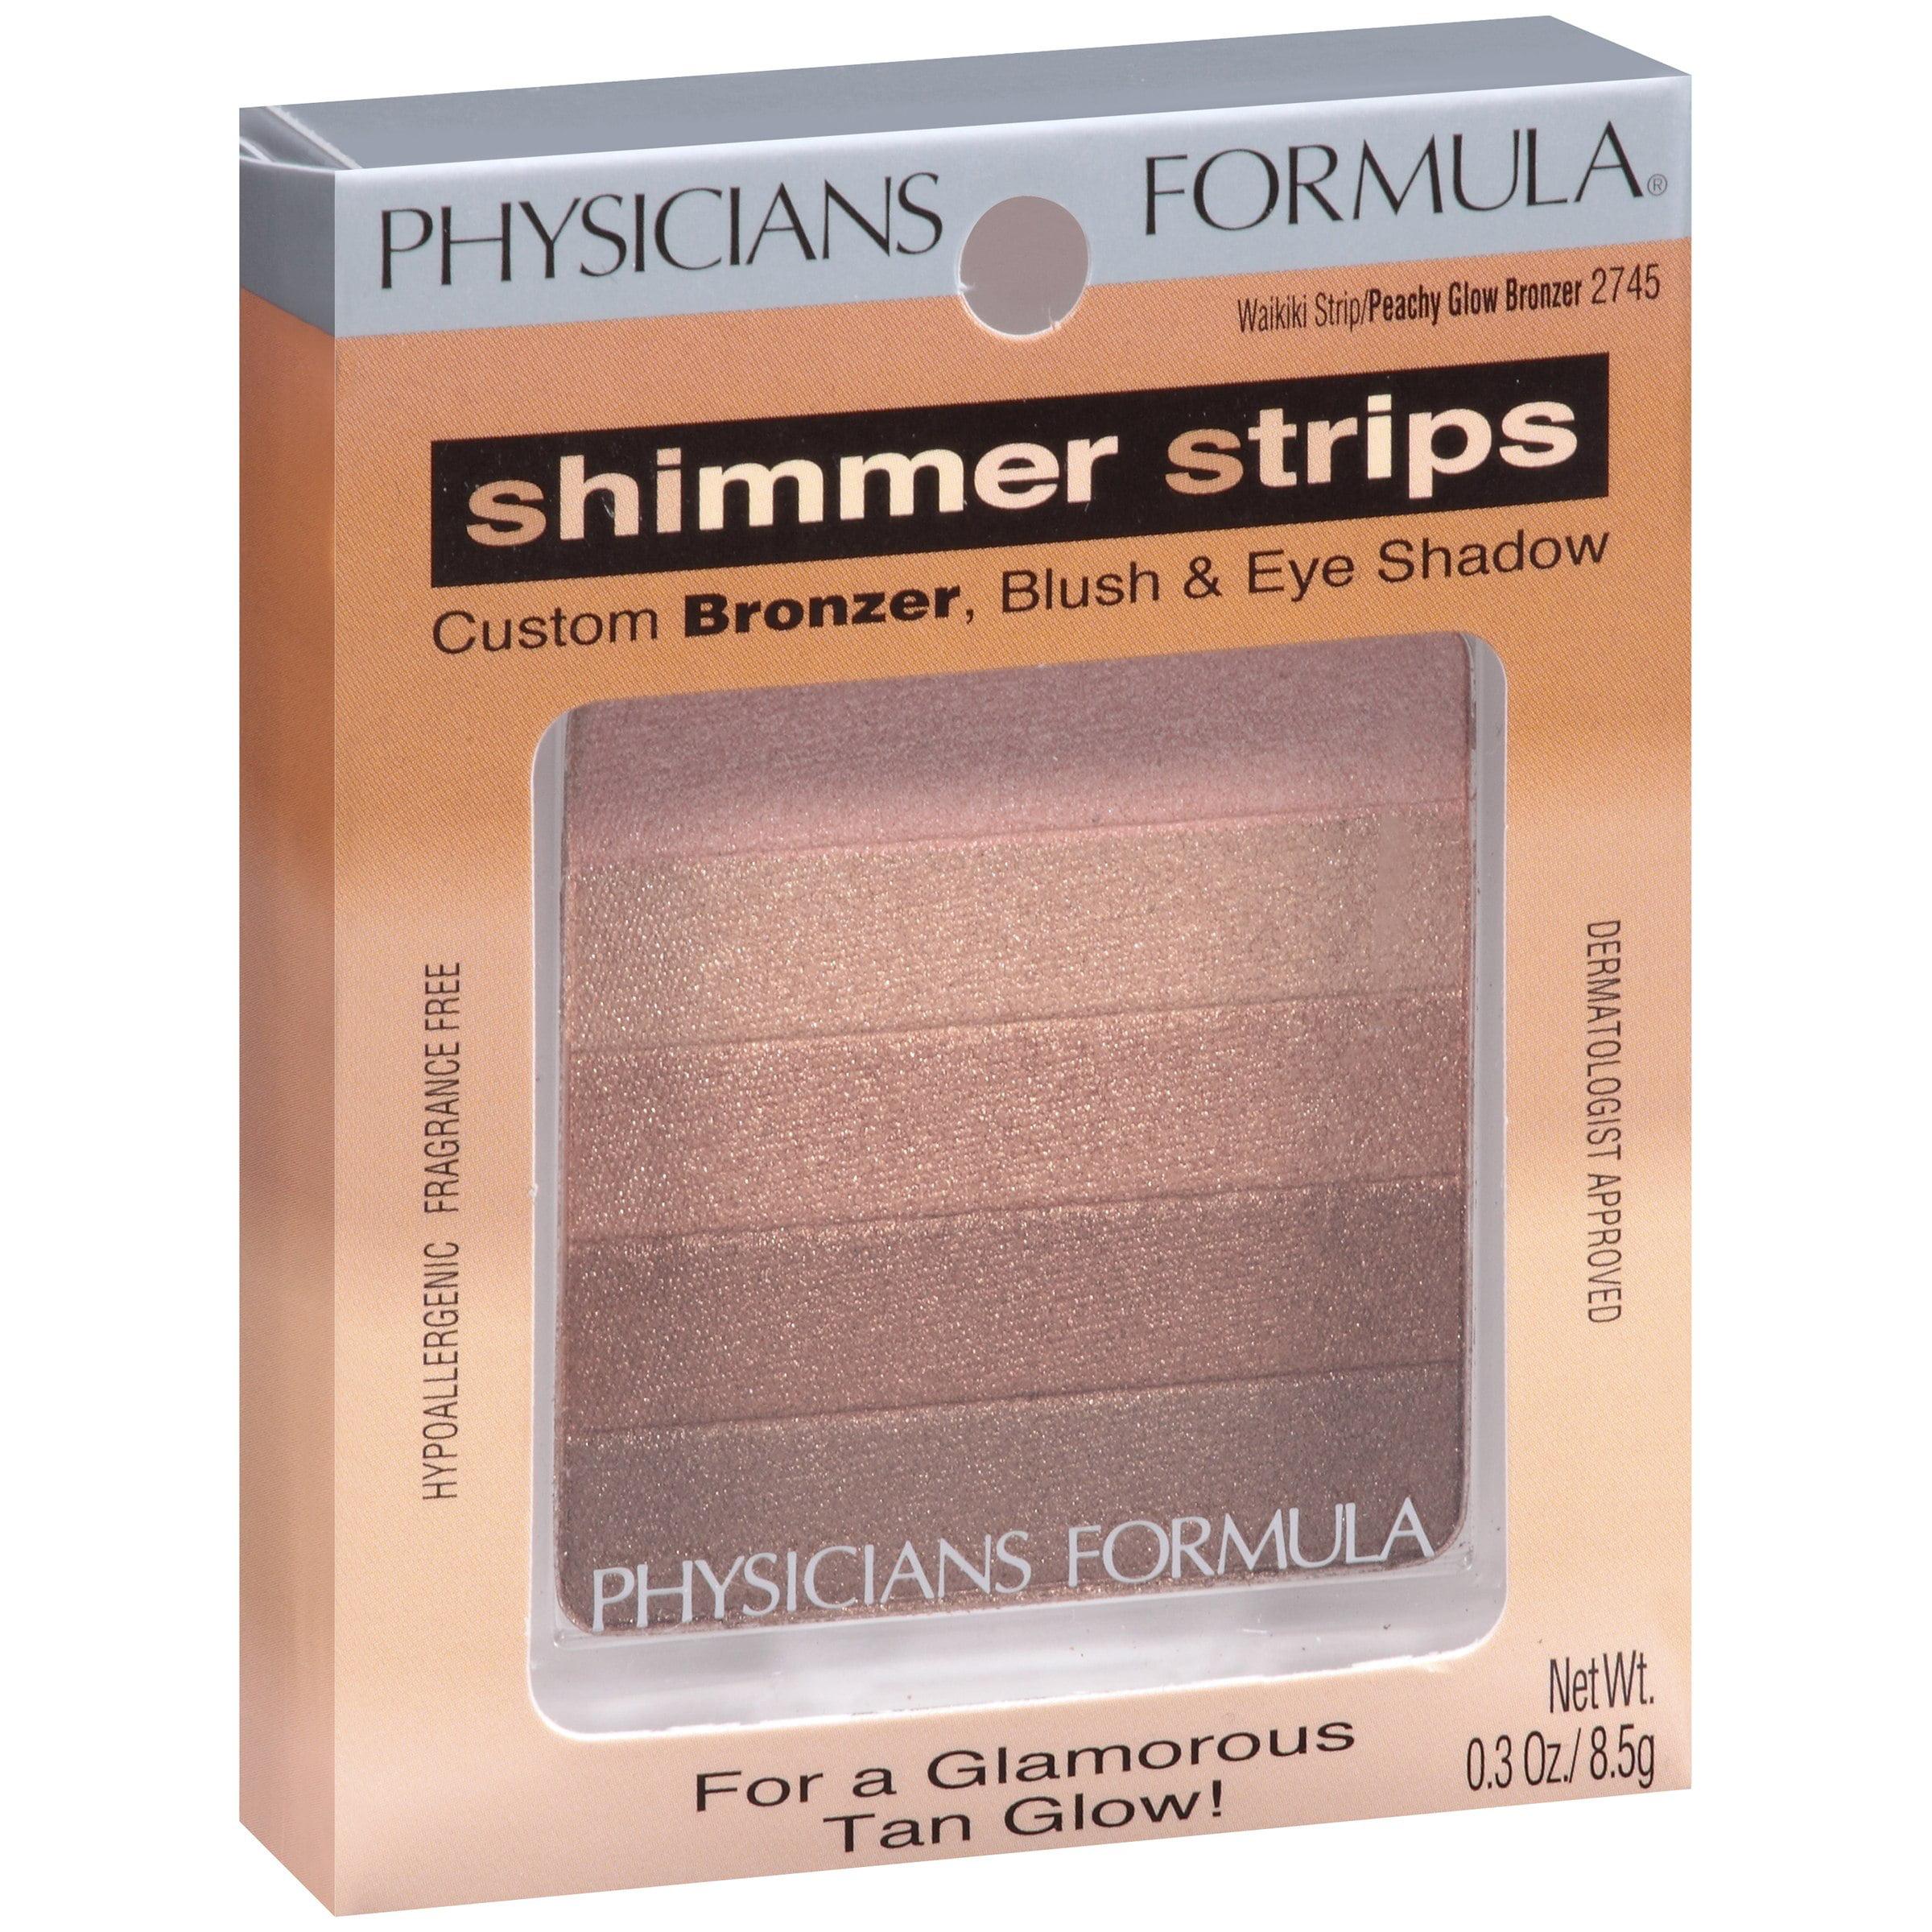 Physicians Formula Shimmer Strips Custom Bronzer, Blush and Eye Shadow, Waikiki Strip Peach Glow 2745